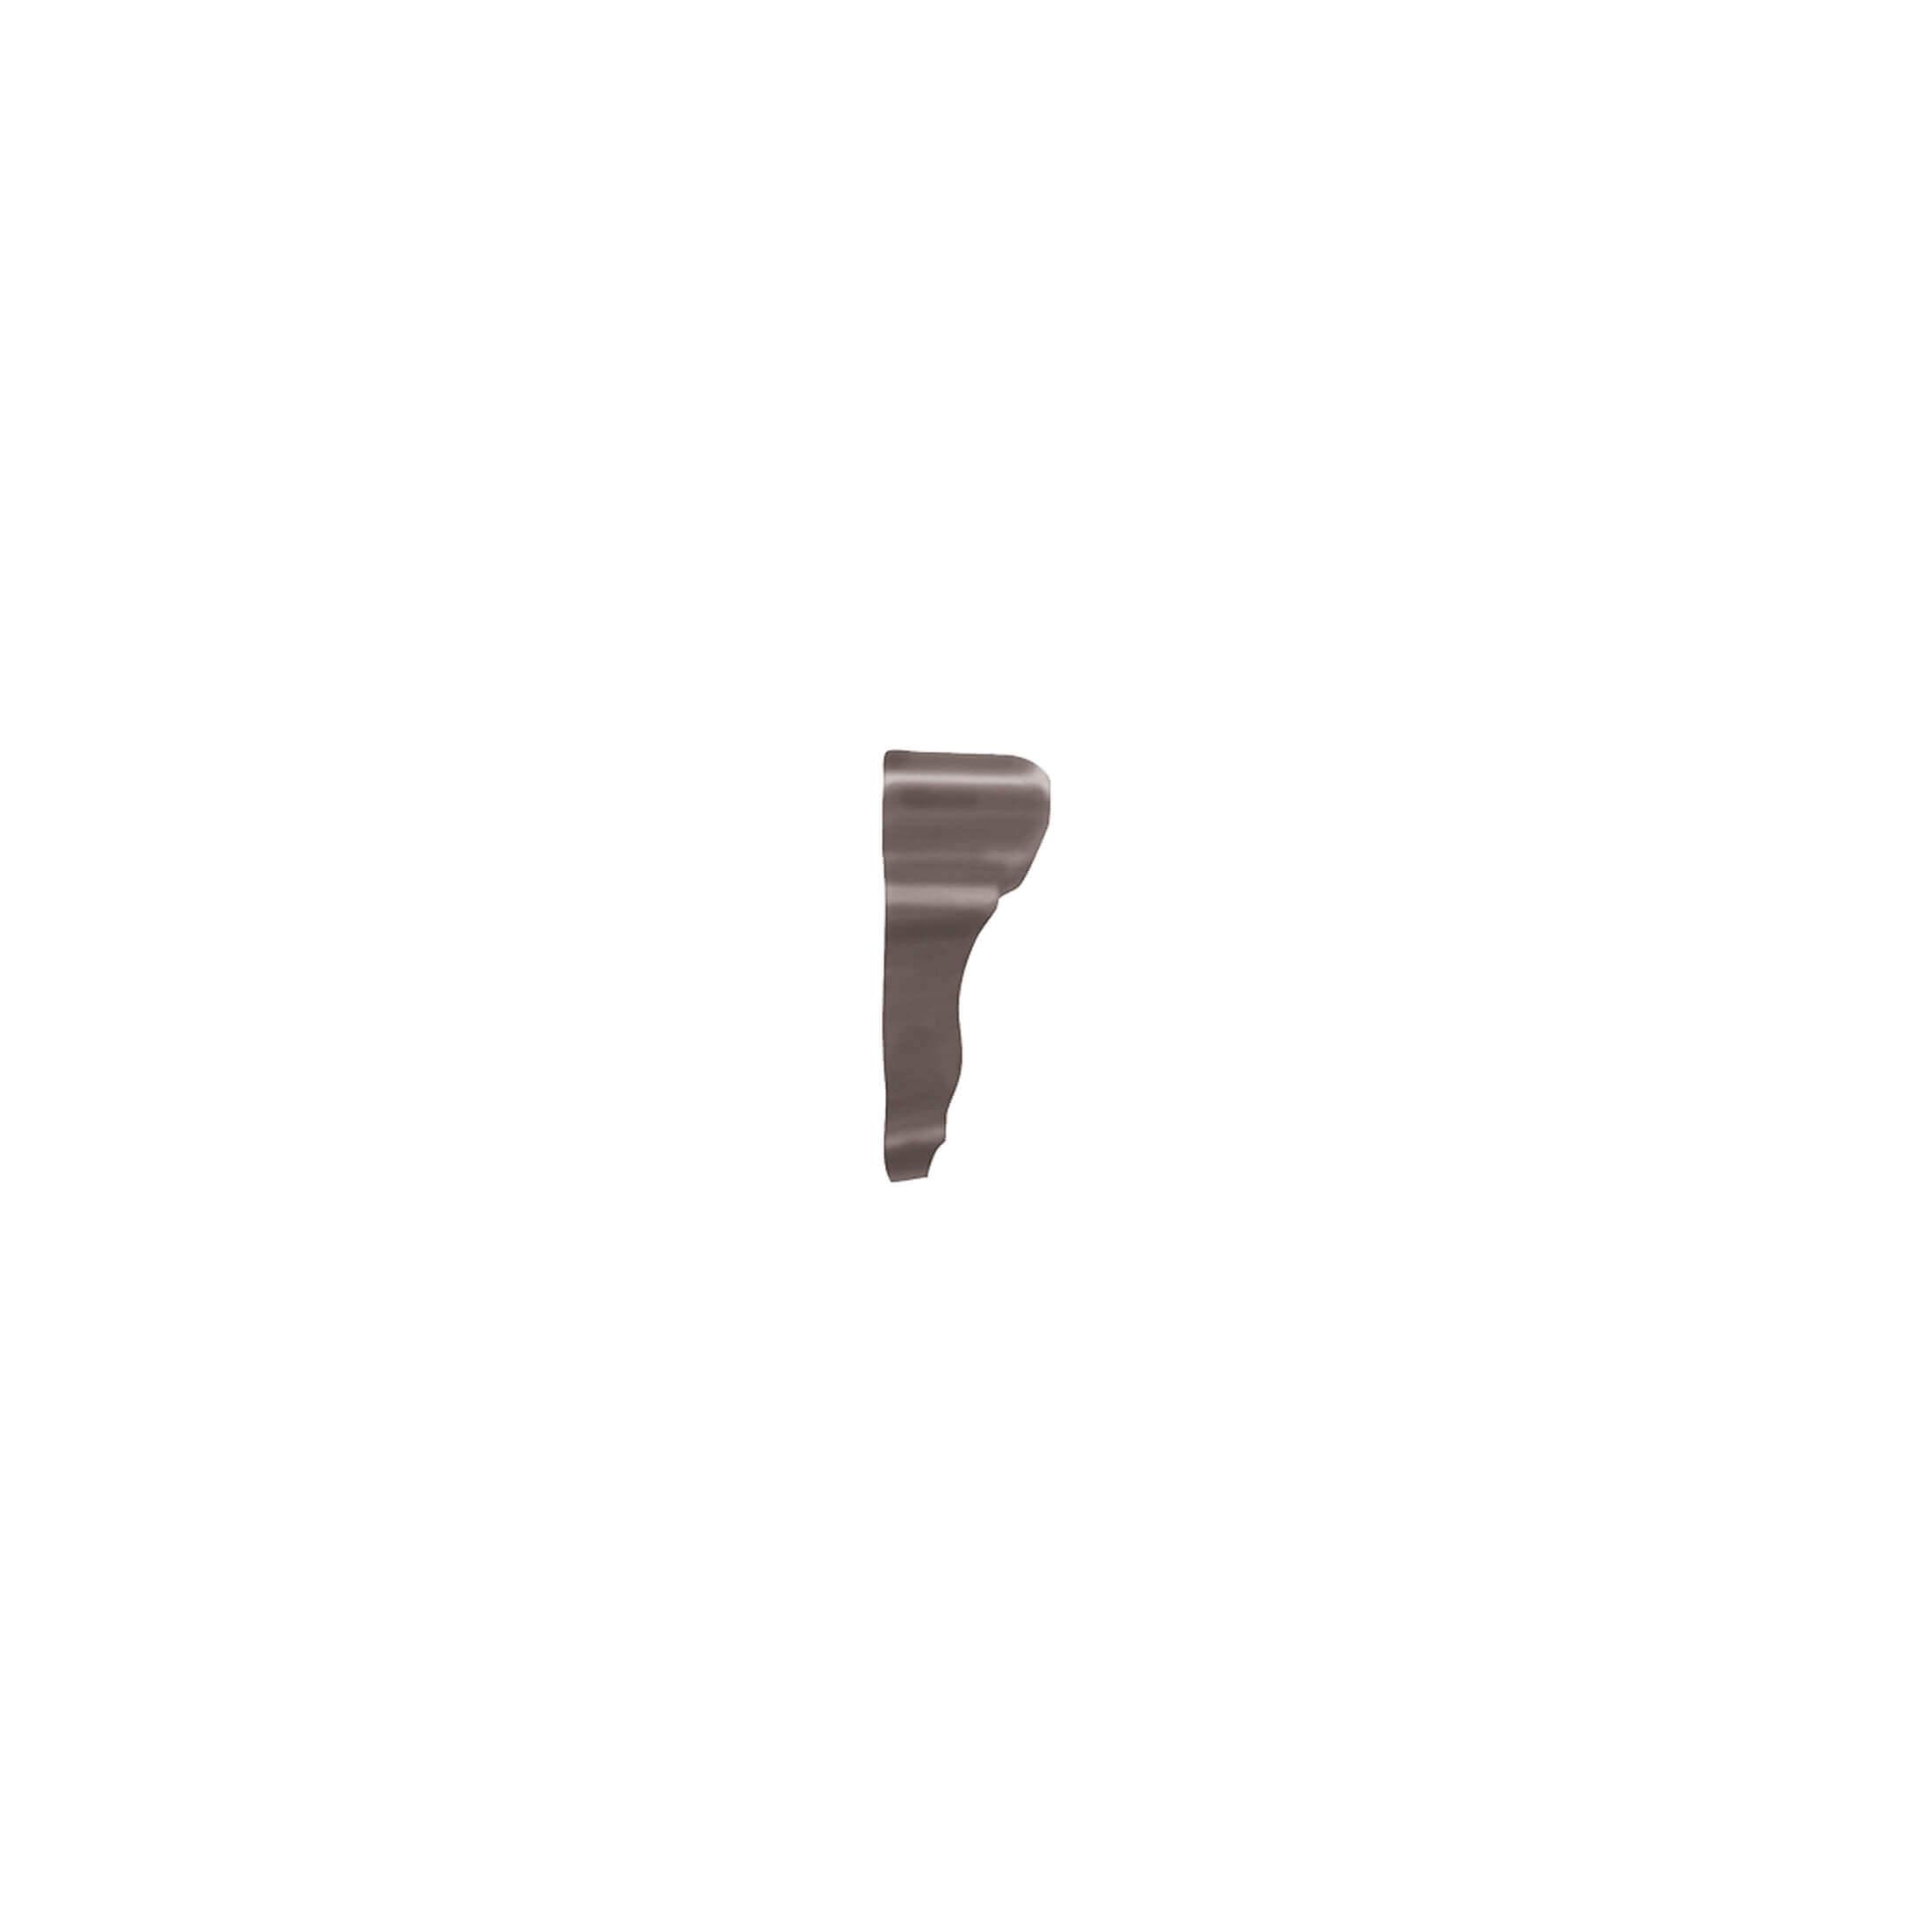 ADST5118 - ANGULO EXTERIOR CORNISA - 7.5 cm X 19.8 cm